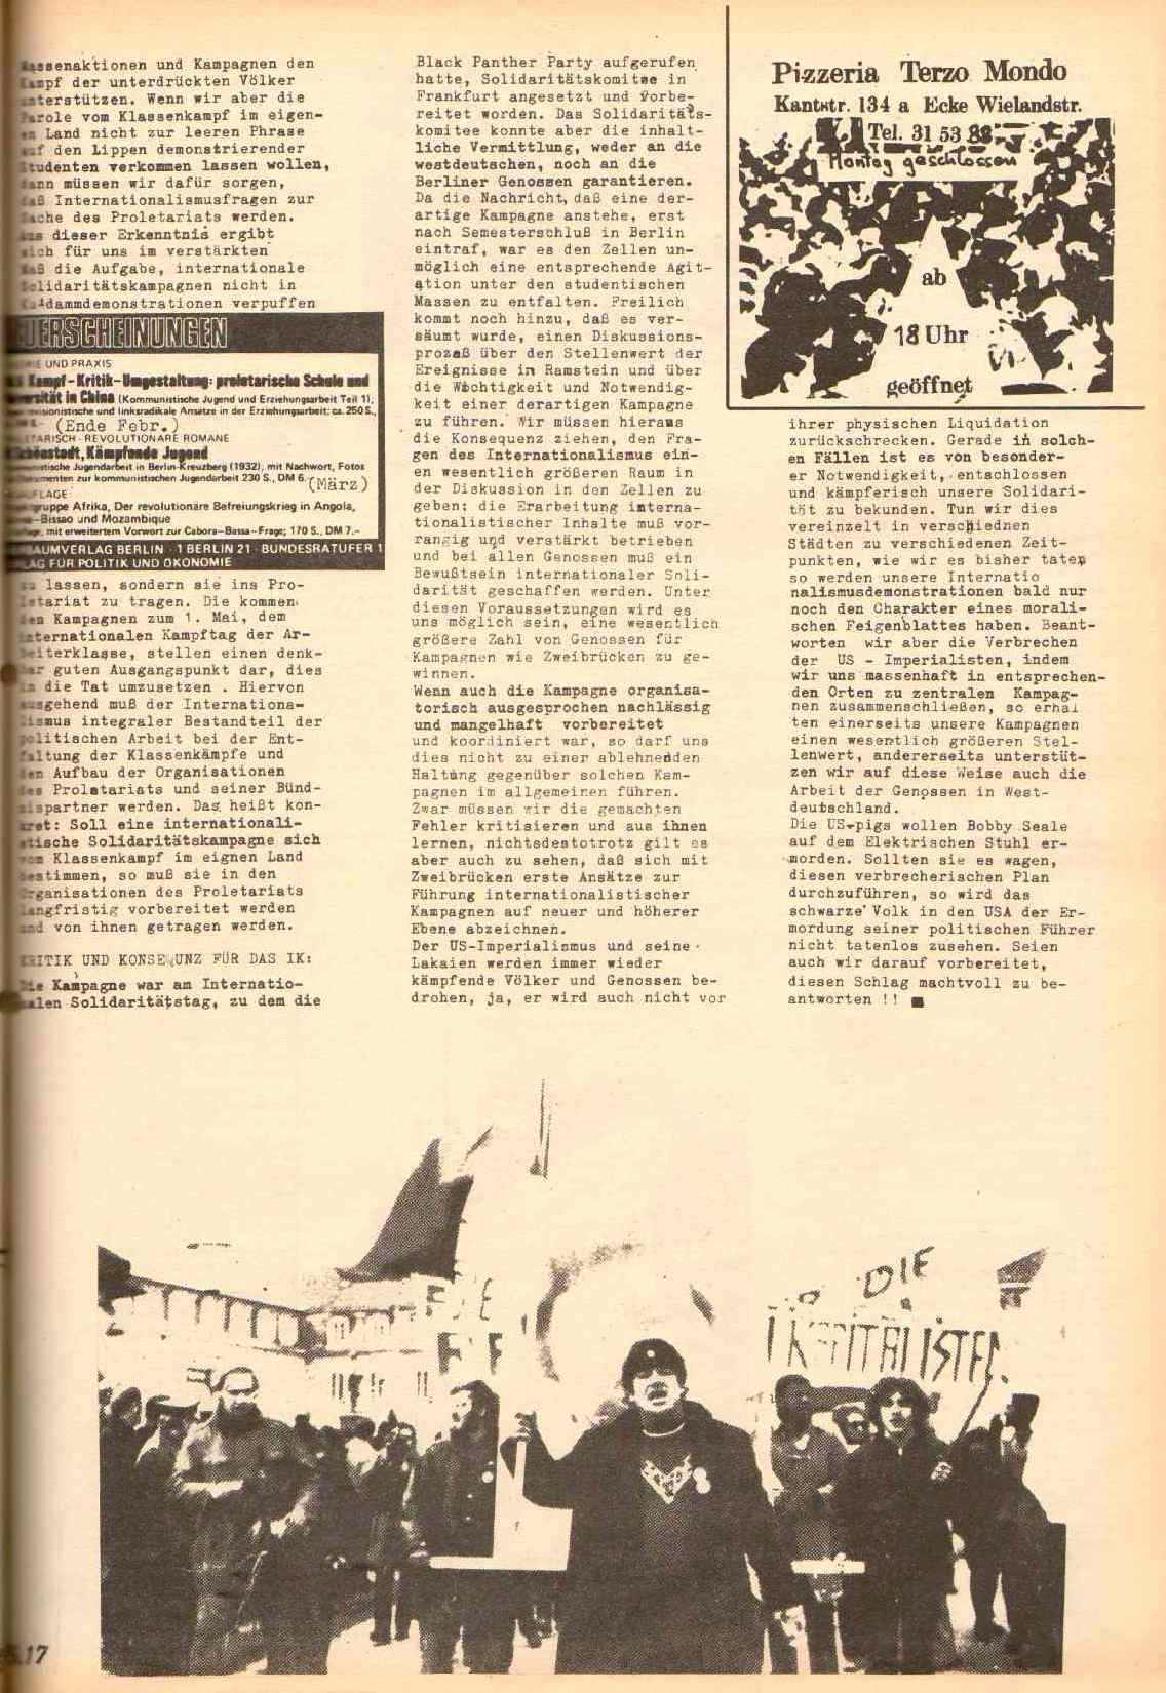 Berlin_Hochschulkampf_1971_04_17